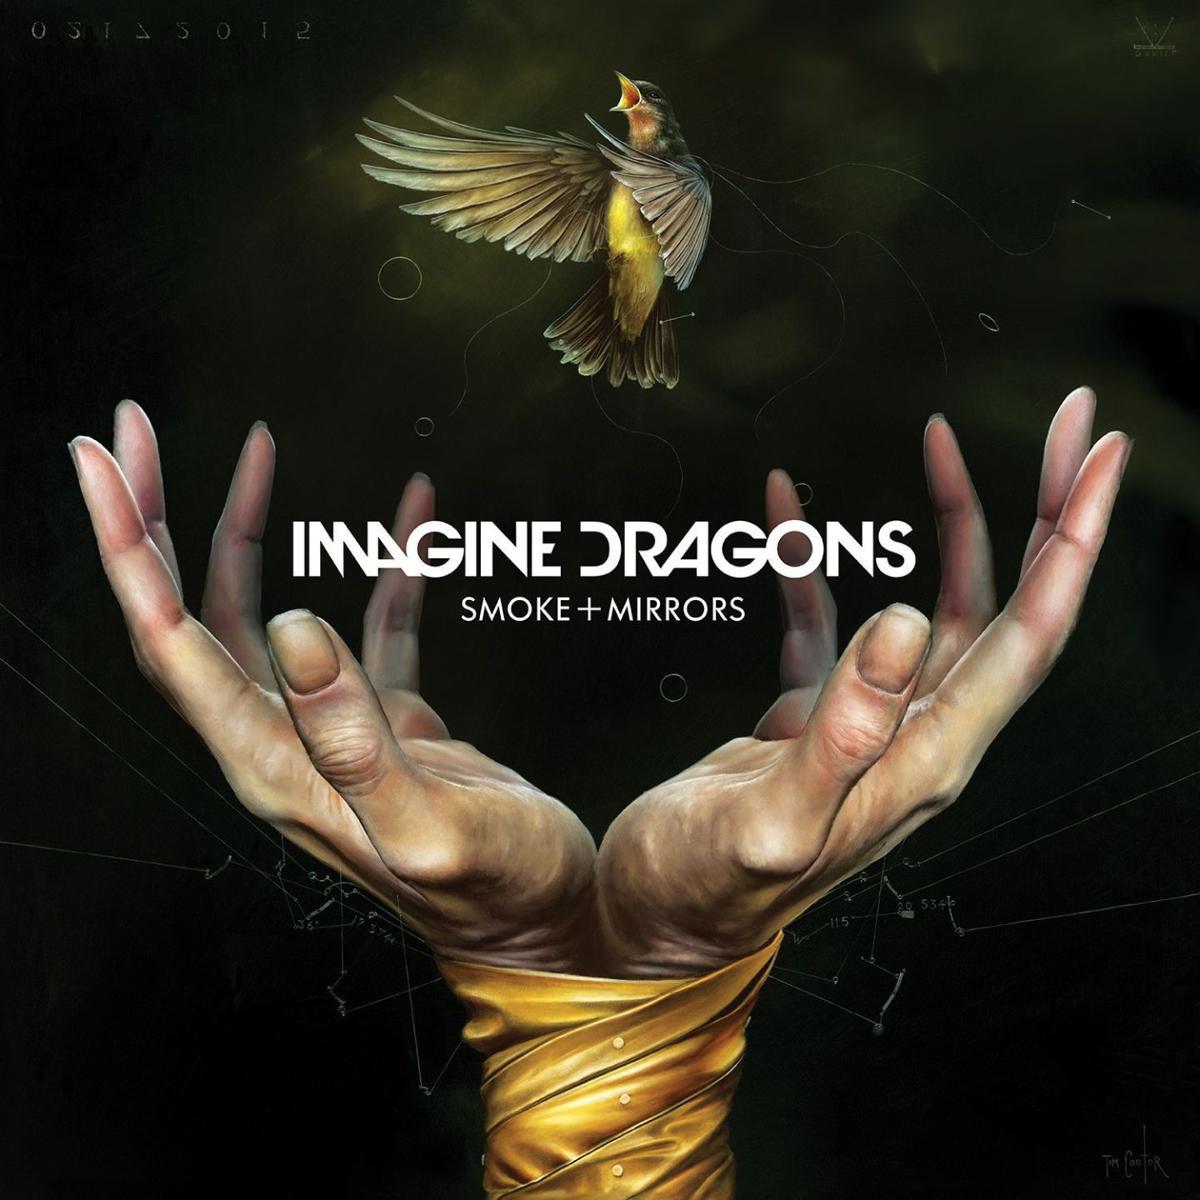 CD reviews: Imagine Dragons, The Mavericks, Sweet & Lynch, Sisqo